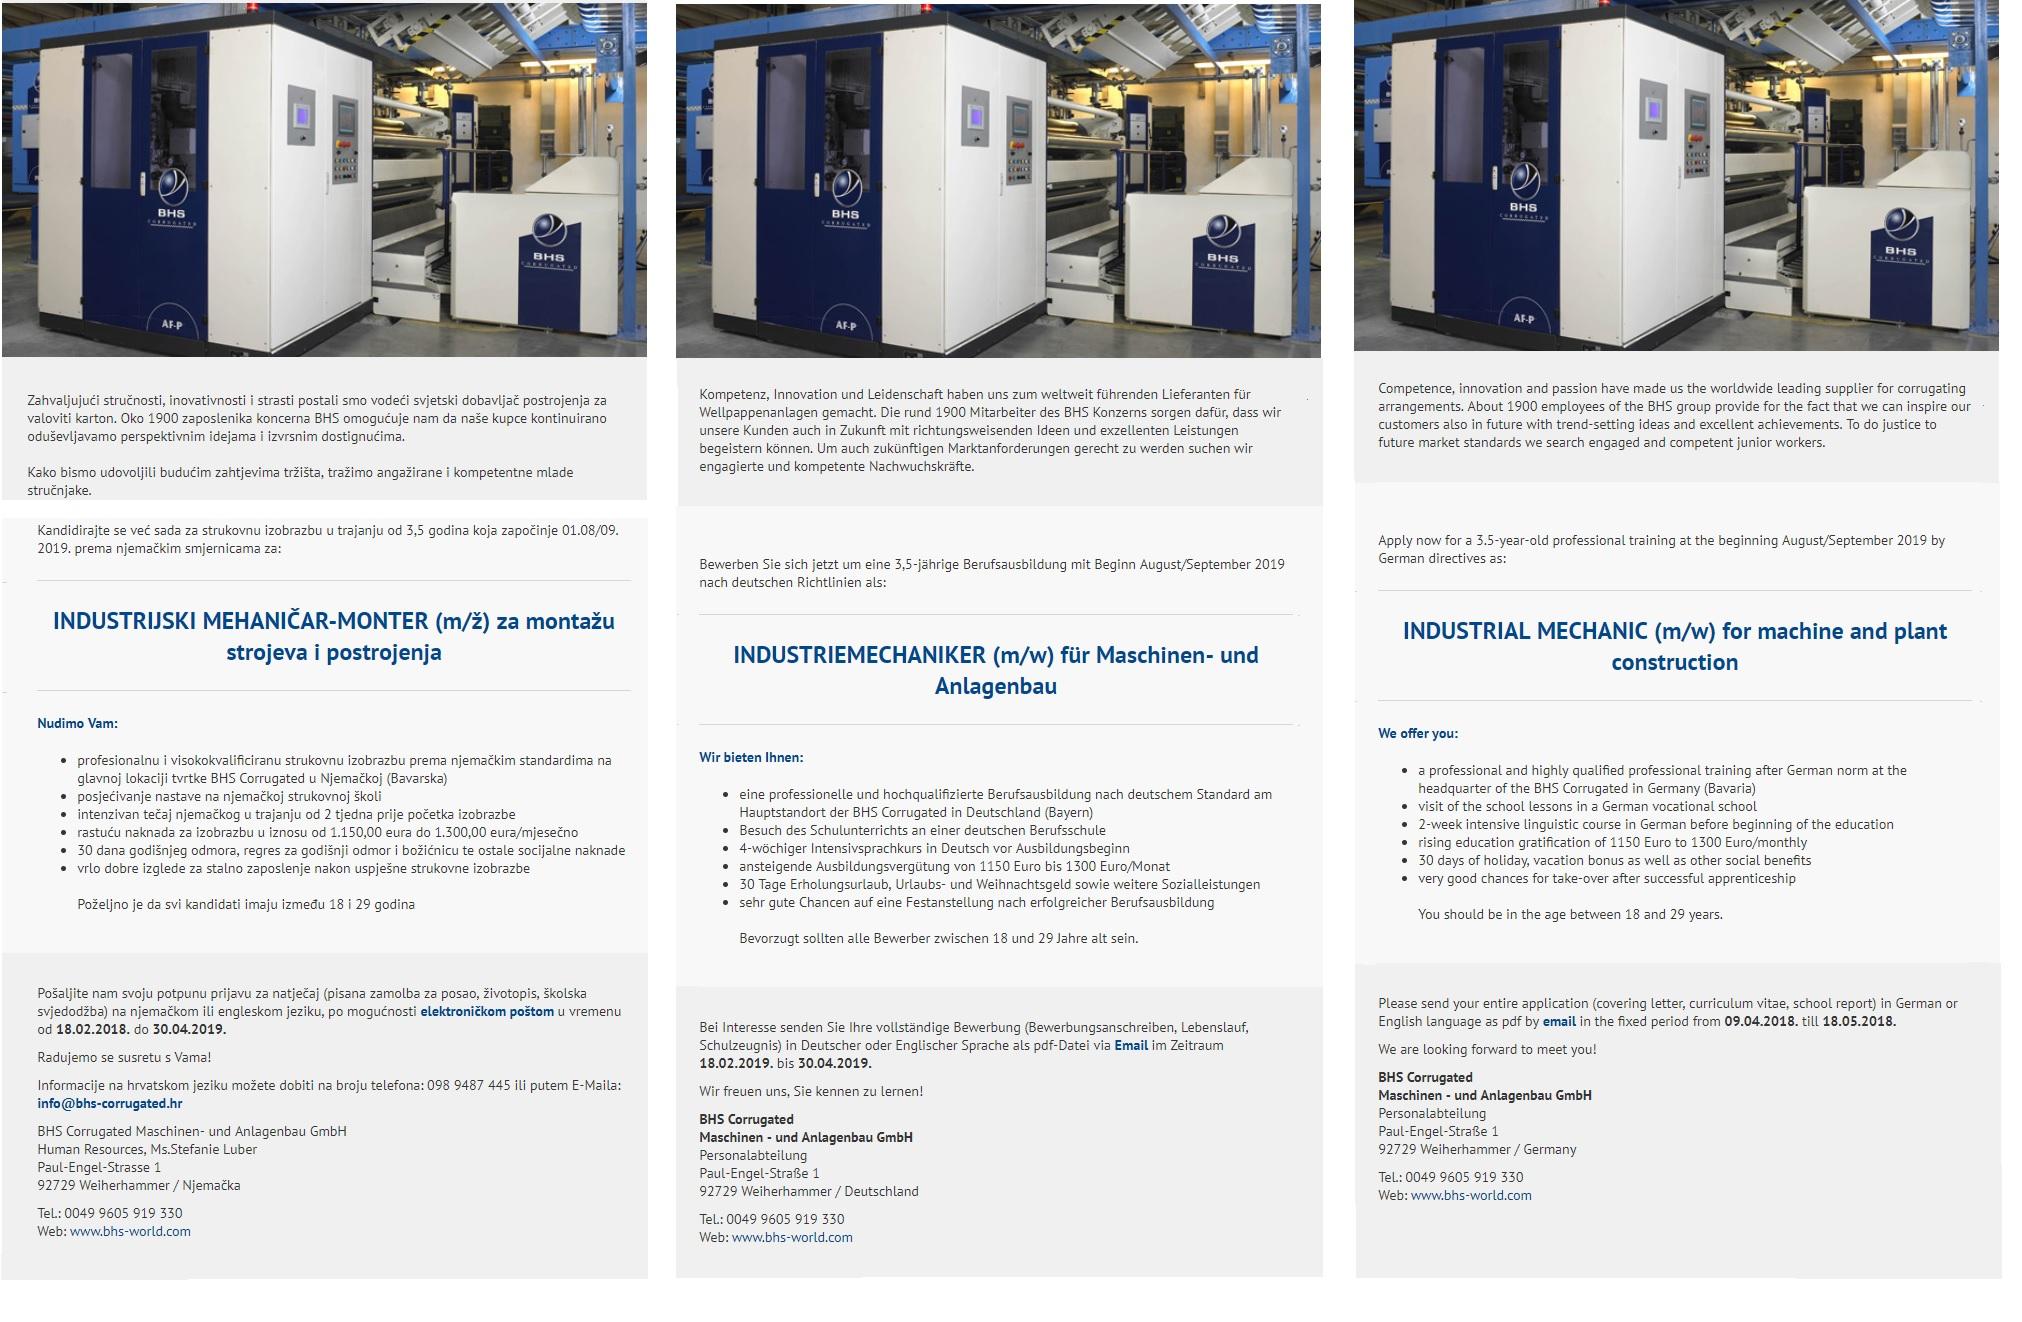 Industrijski mehaničar - Monter (m/ž) za montažu strojeva i postrojenja